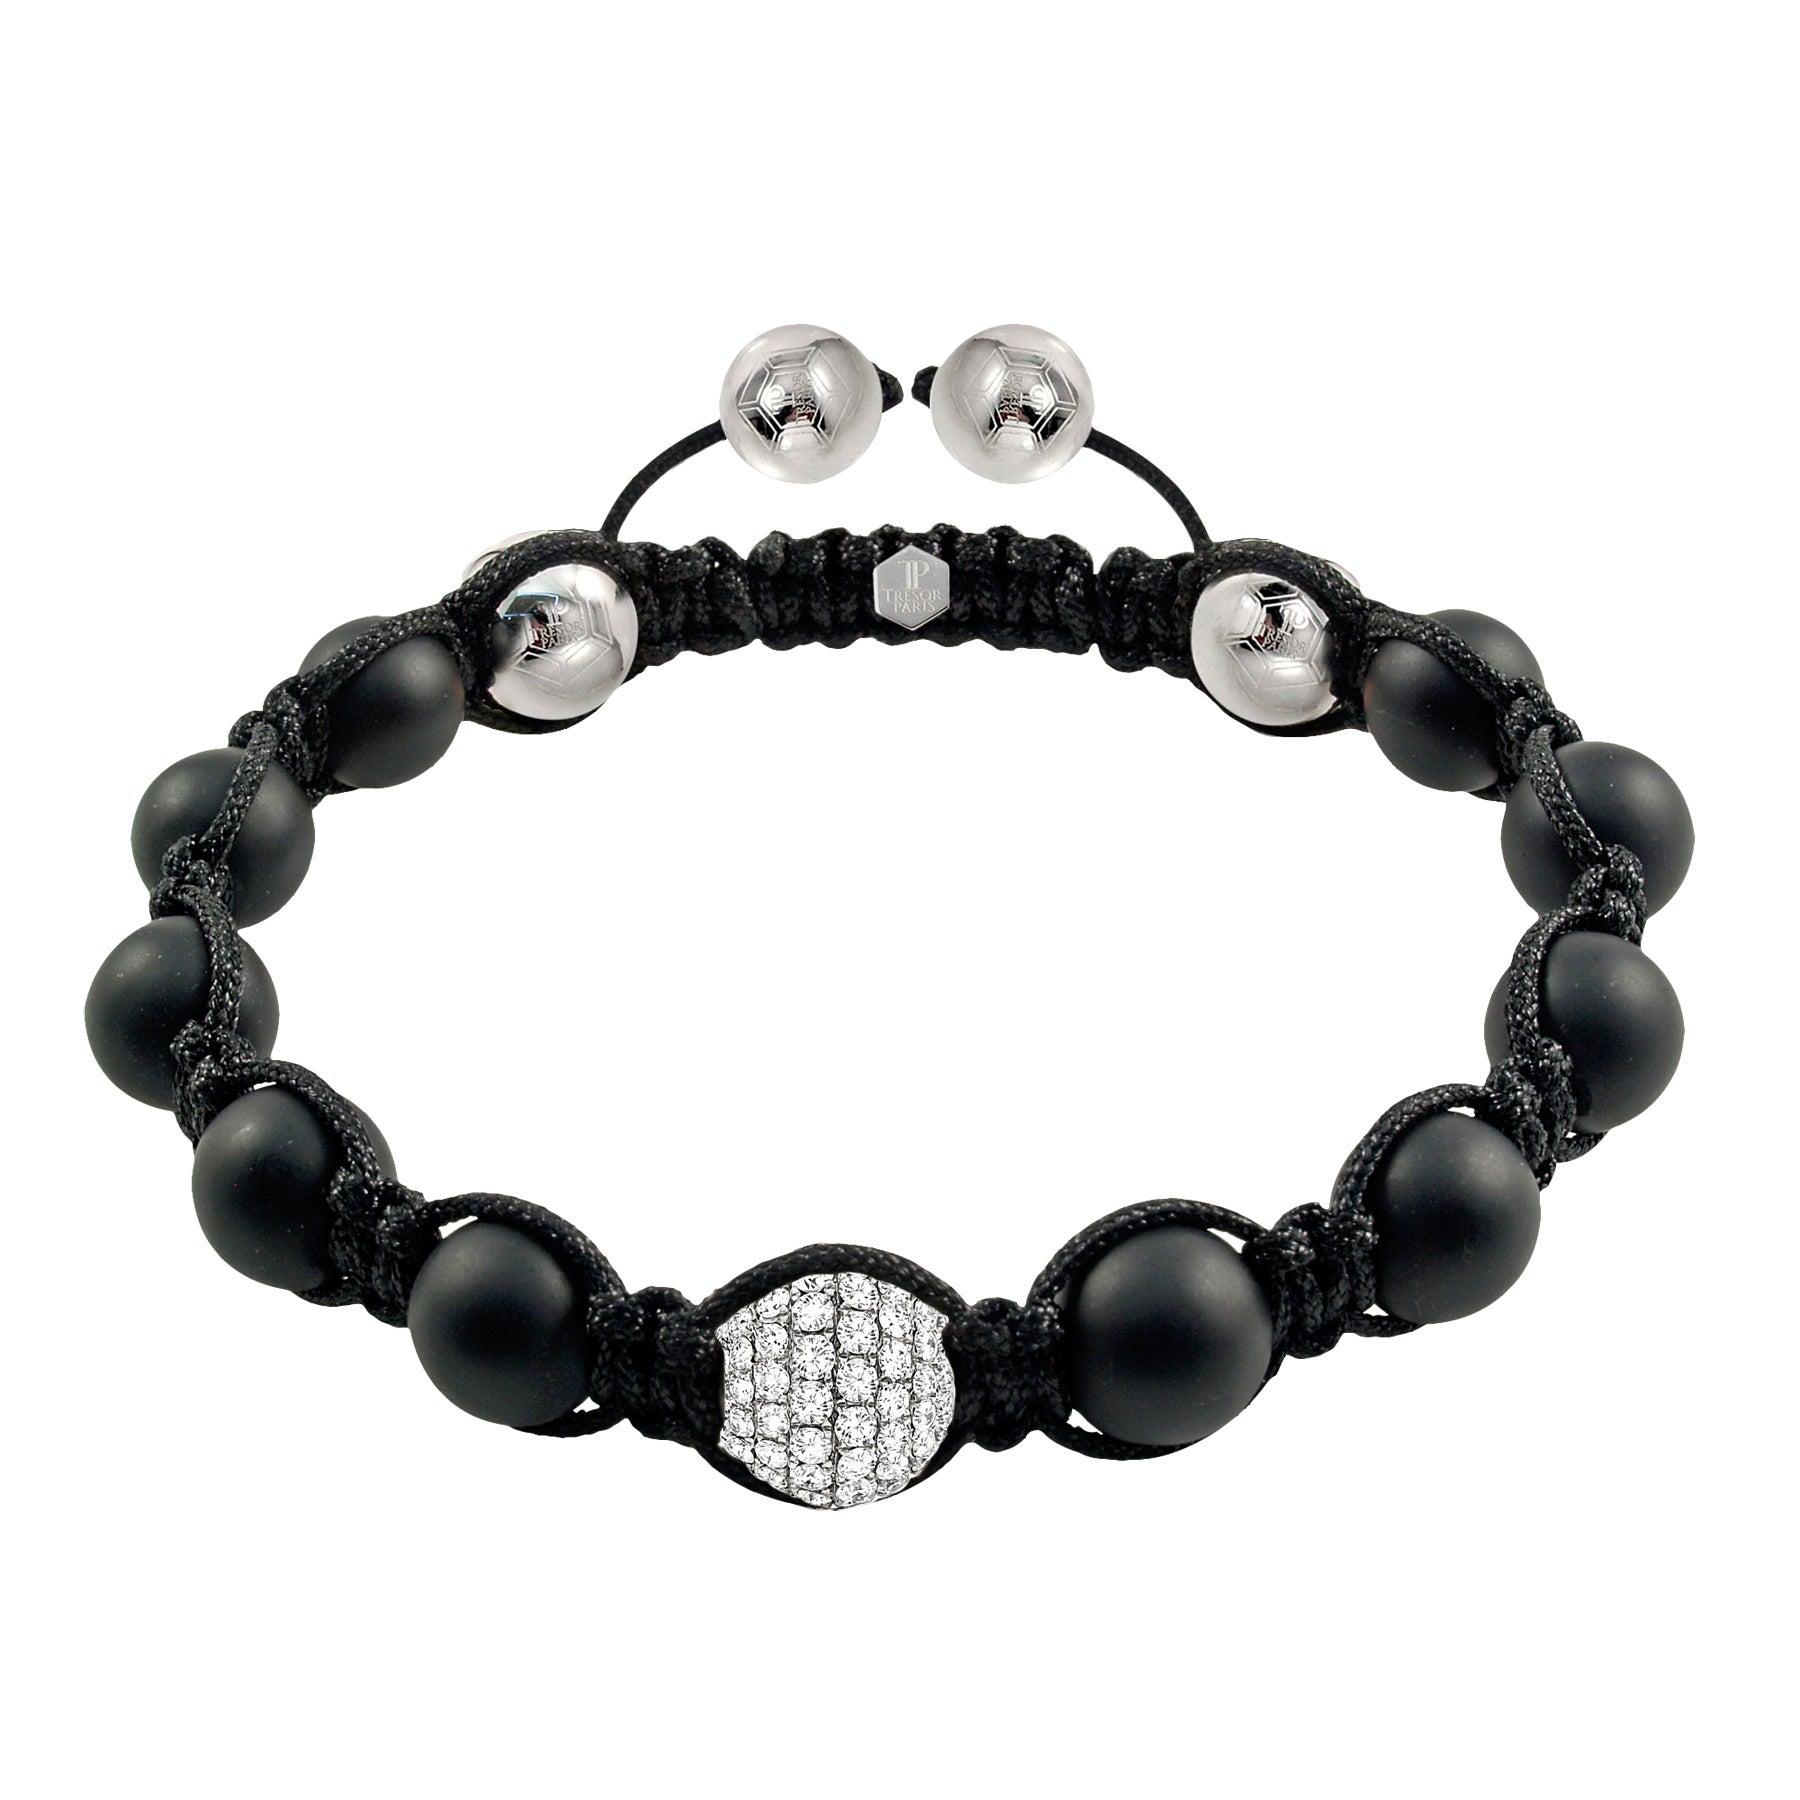 1.80 Carat Round White Diamond 18 Karat Gold Black Agate Men's Beaded Bracelet